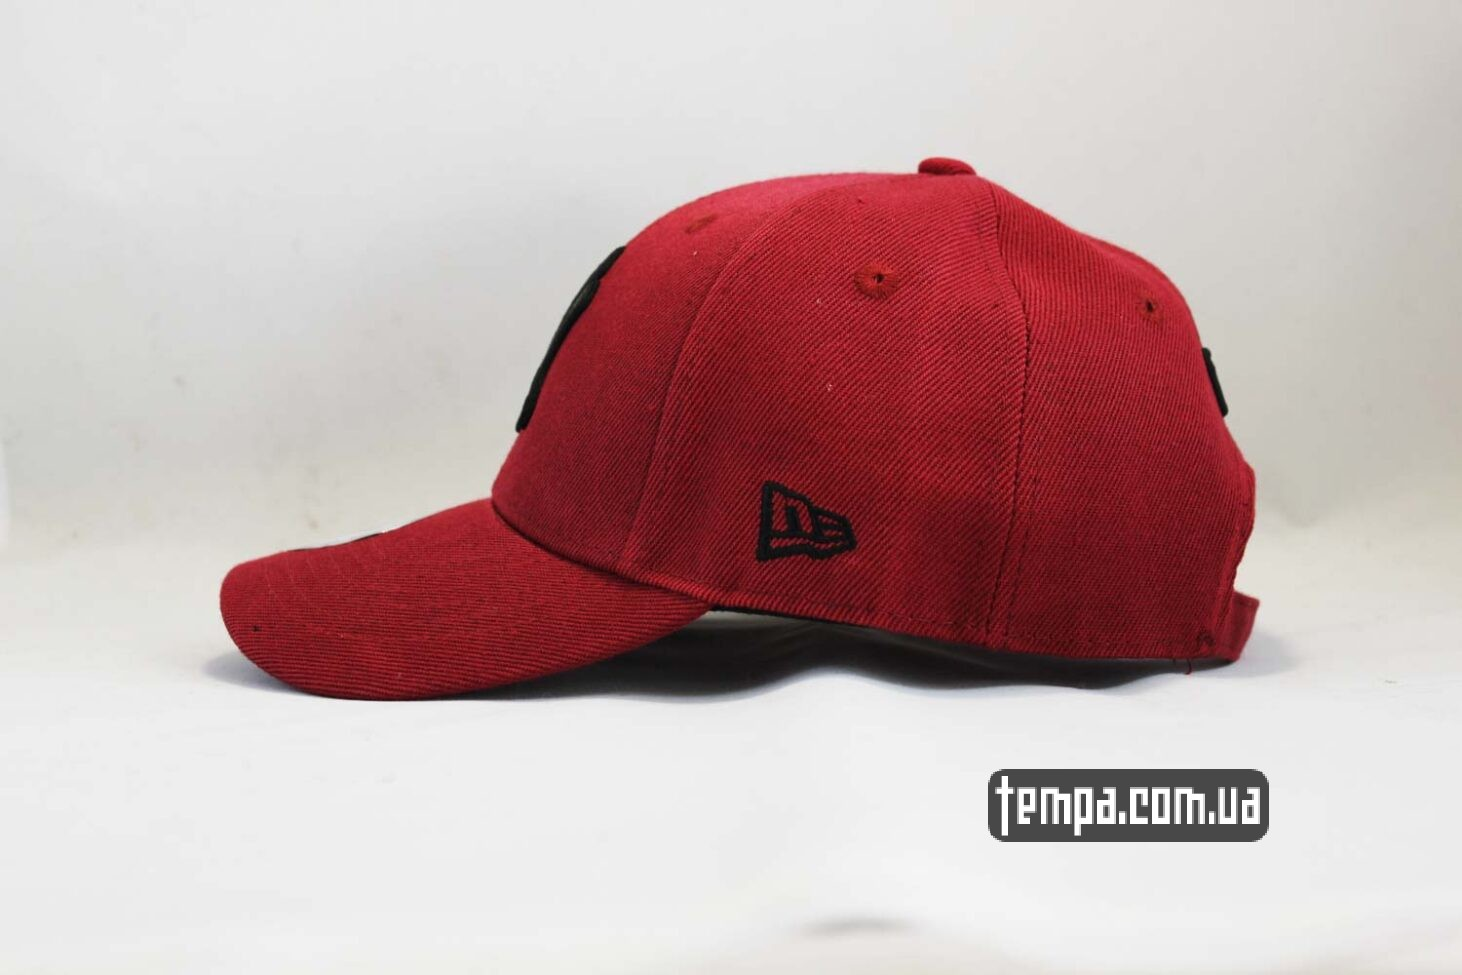 baseball cap кепка бейсболка Янки Yankees New York New Era красая